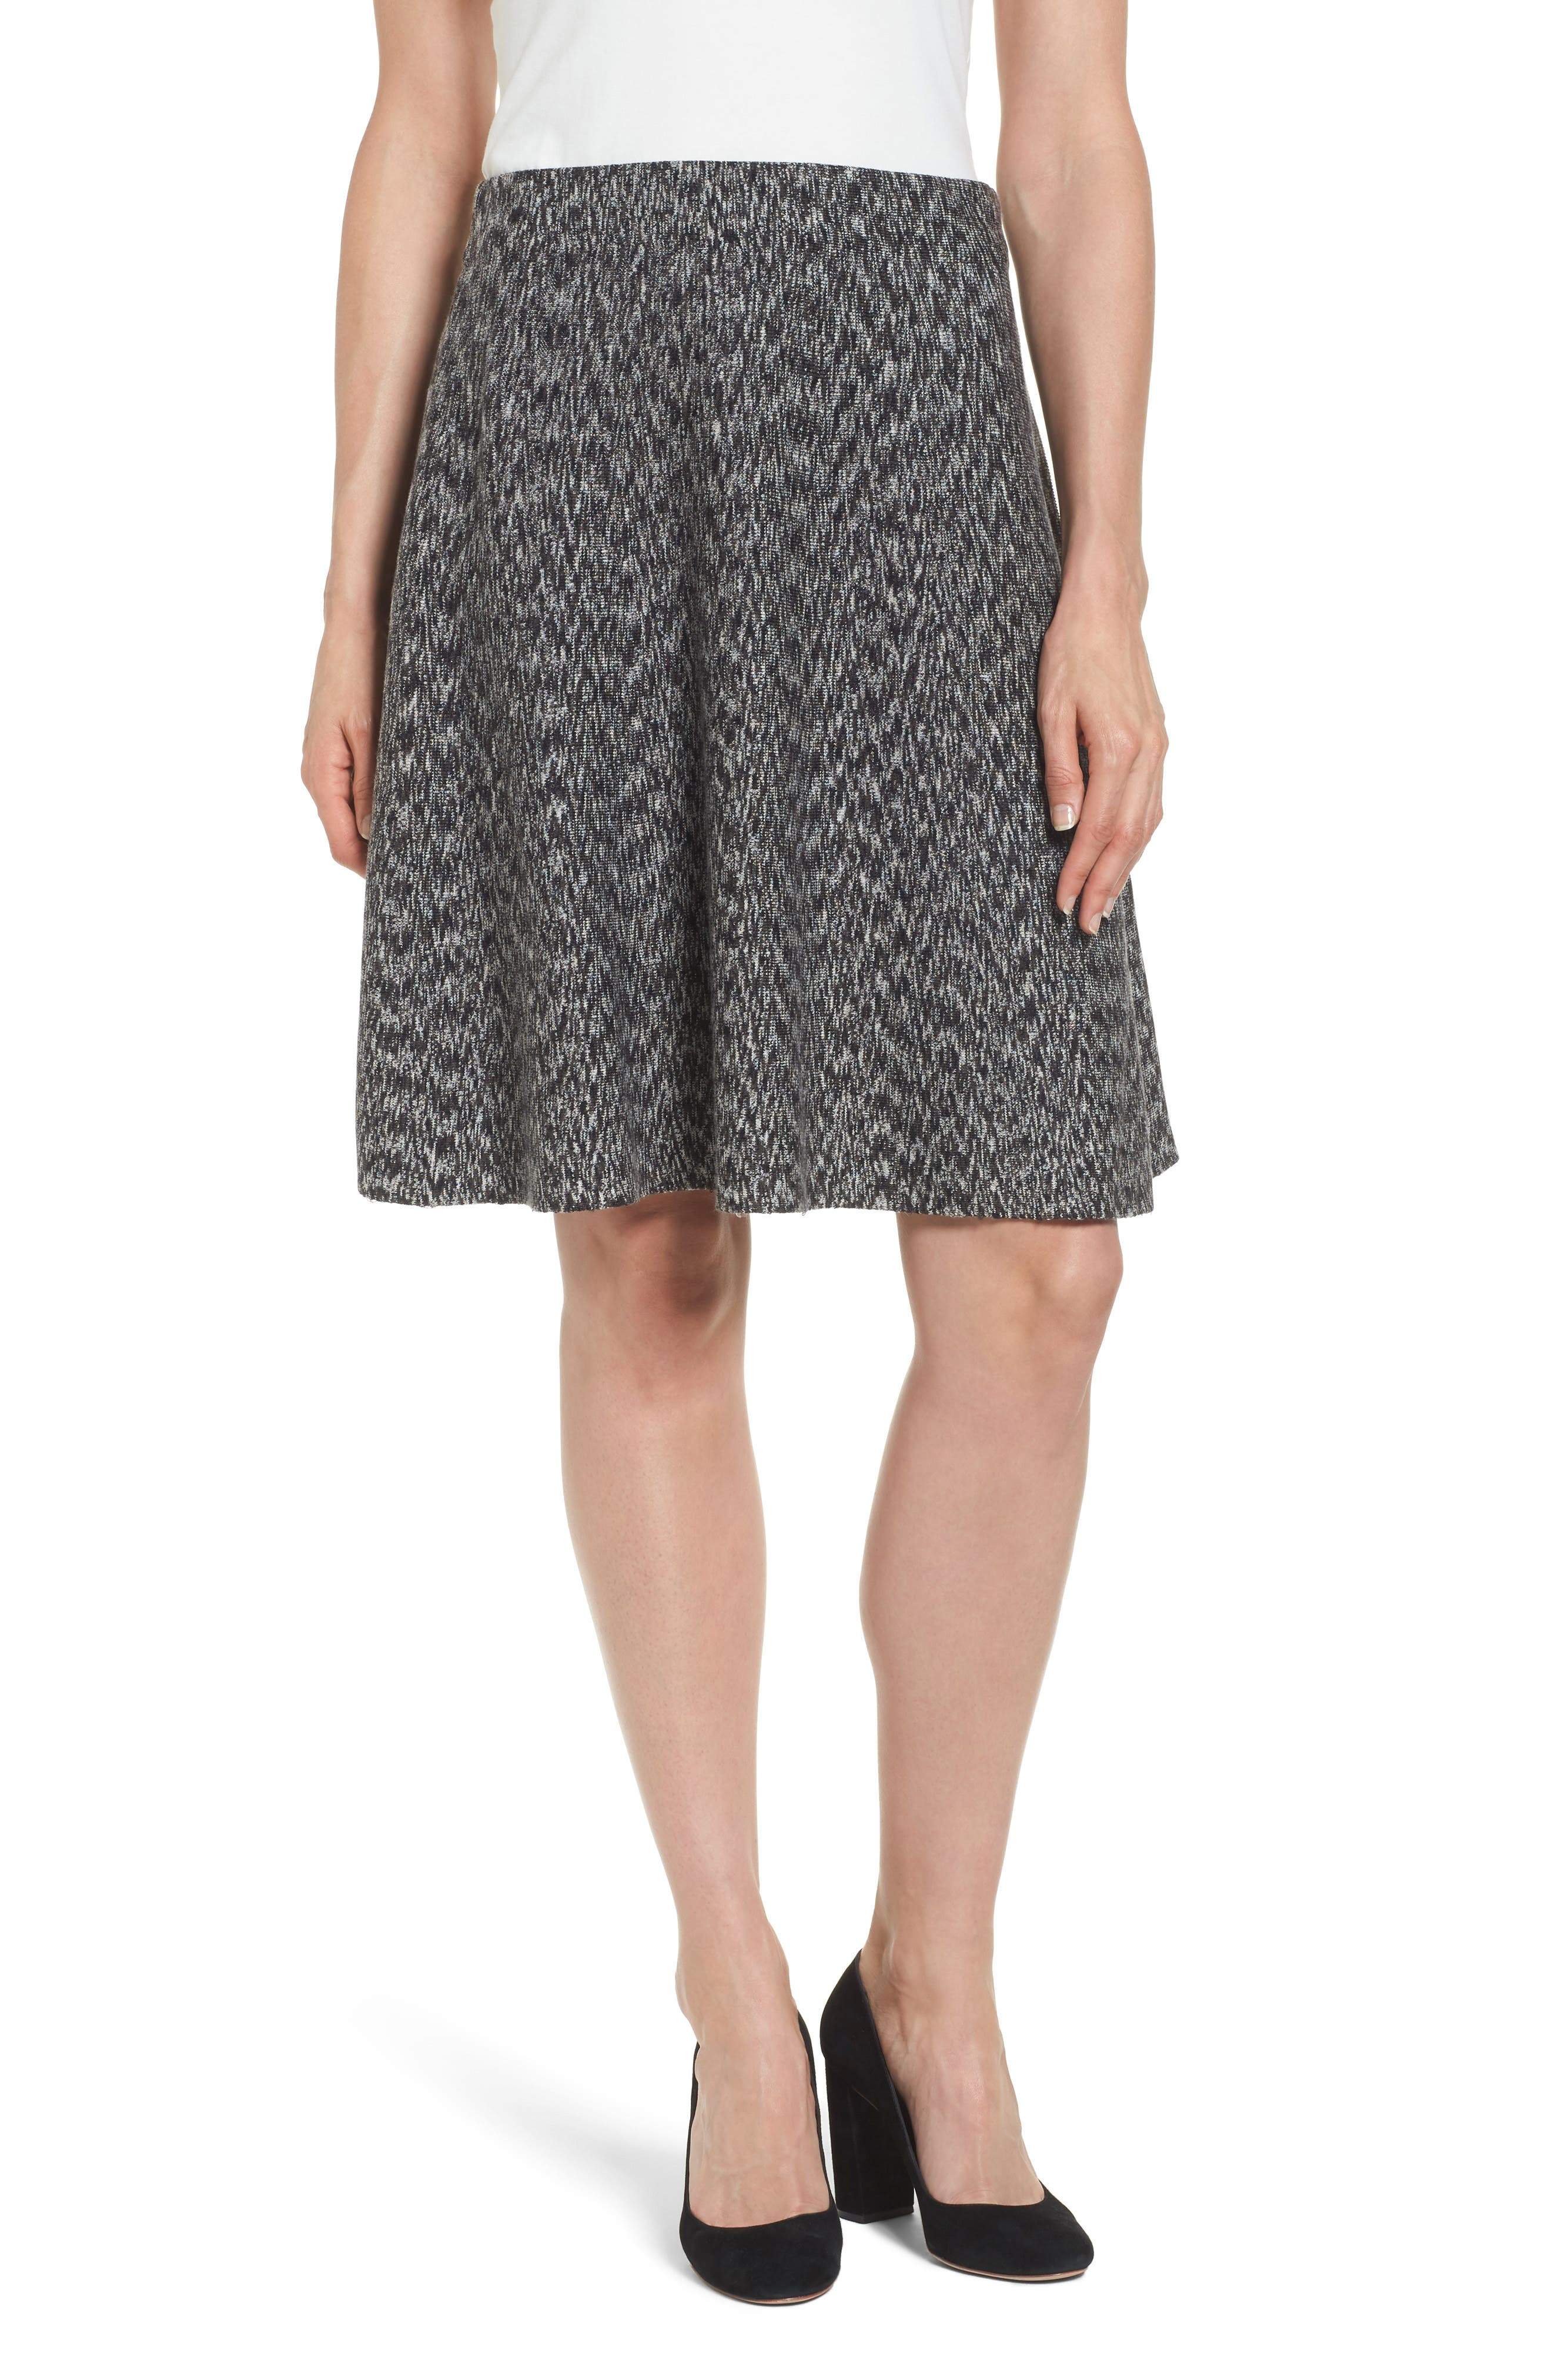 NIC + ZOE Mountain Rose Skirt